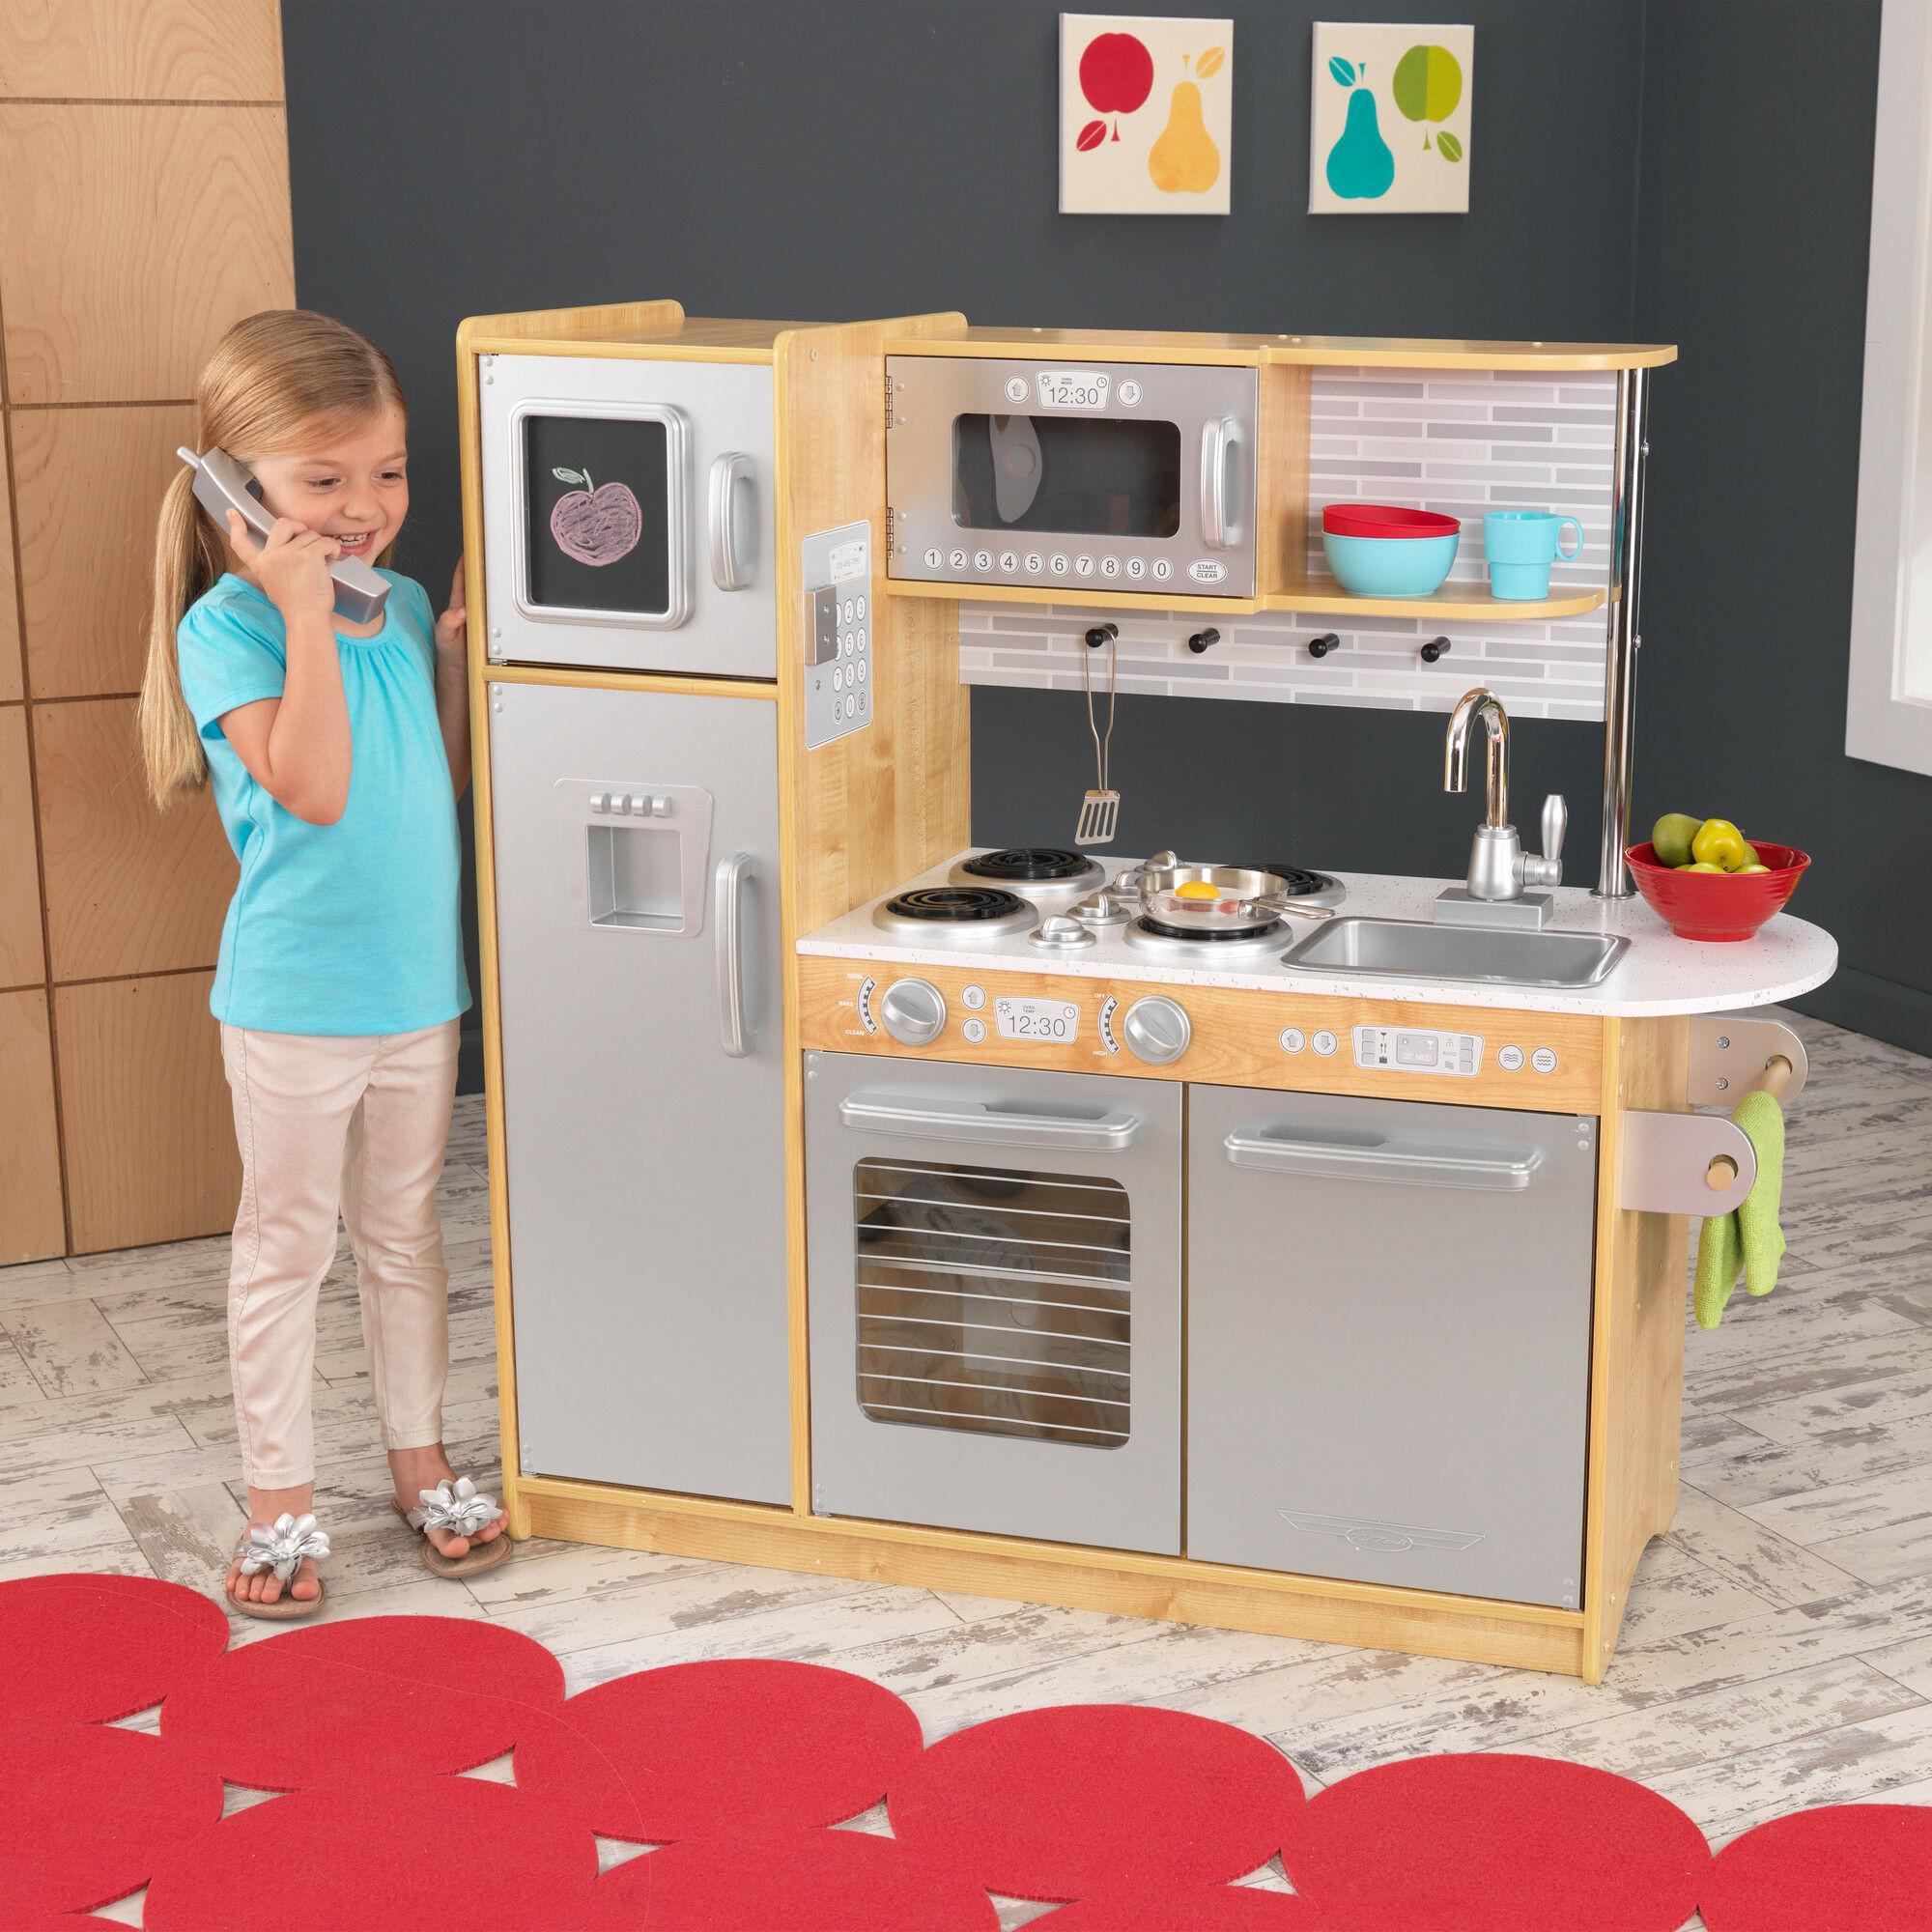 kidkraft spielküche, kidkraft küche   kidkraft shop